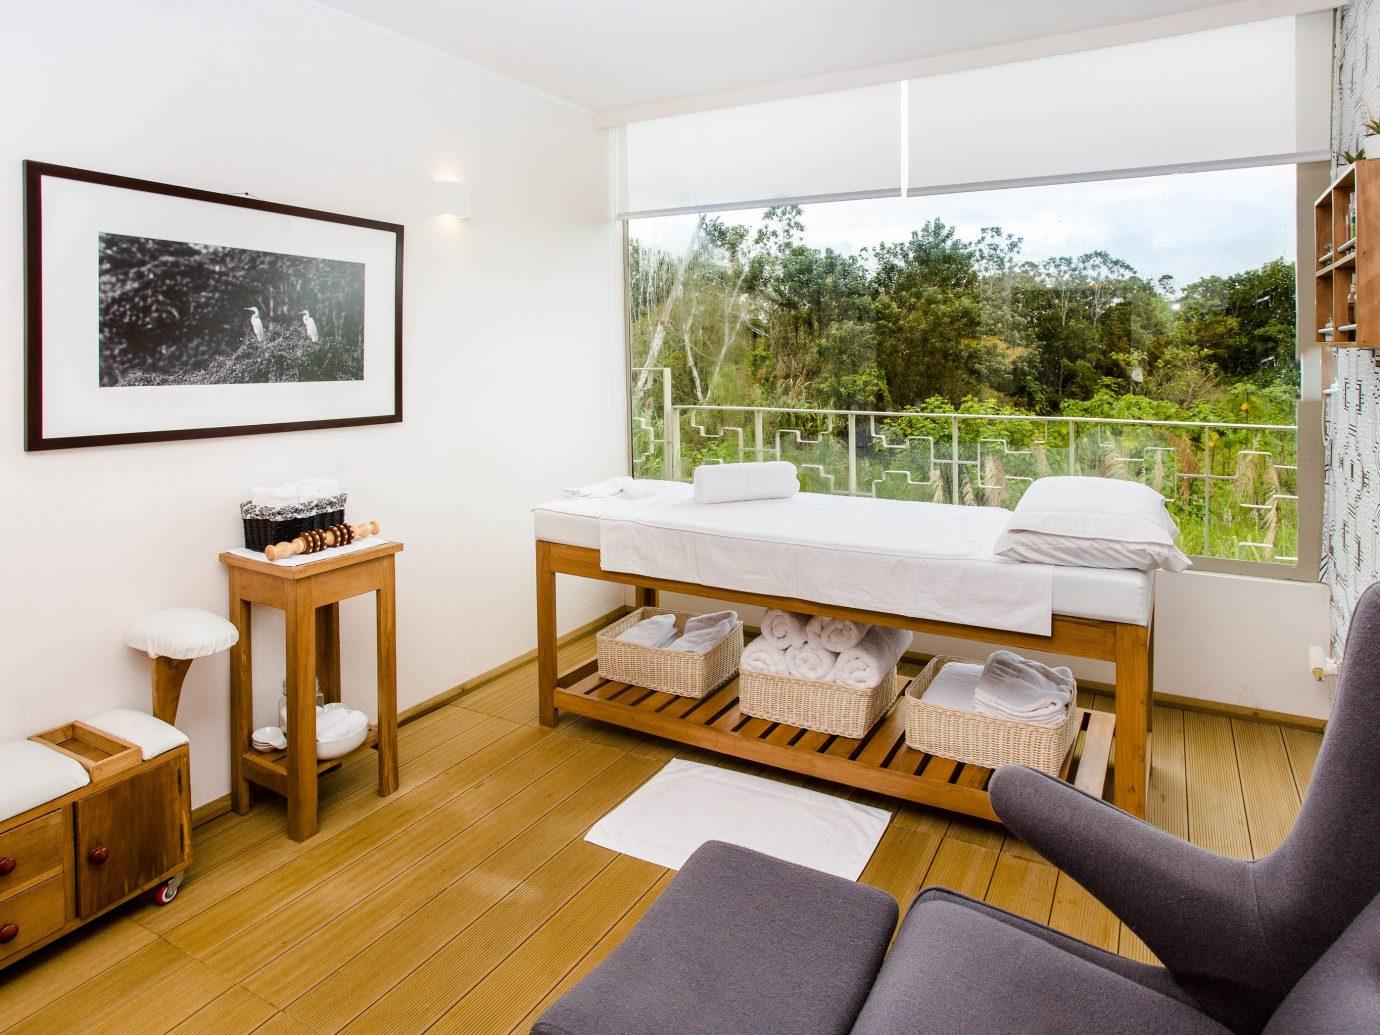 Travel Tips indoor wall floor property room window interior design real estate house living room interior designer furniture